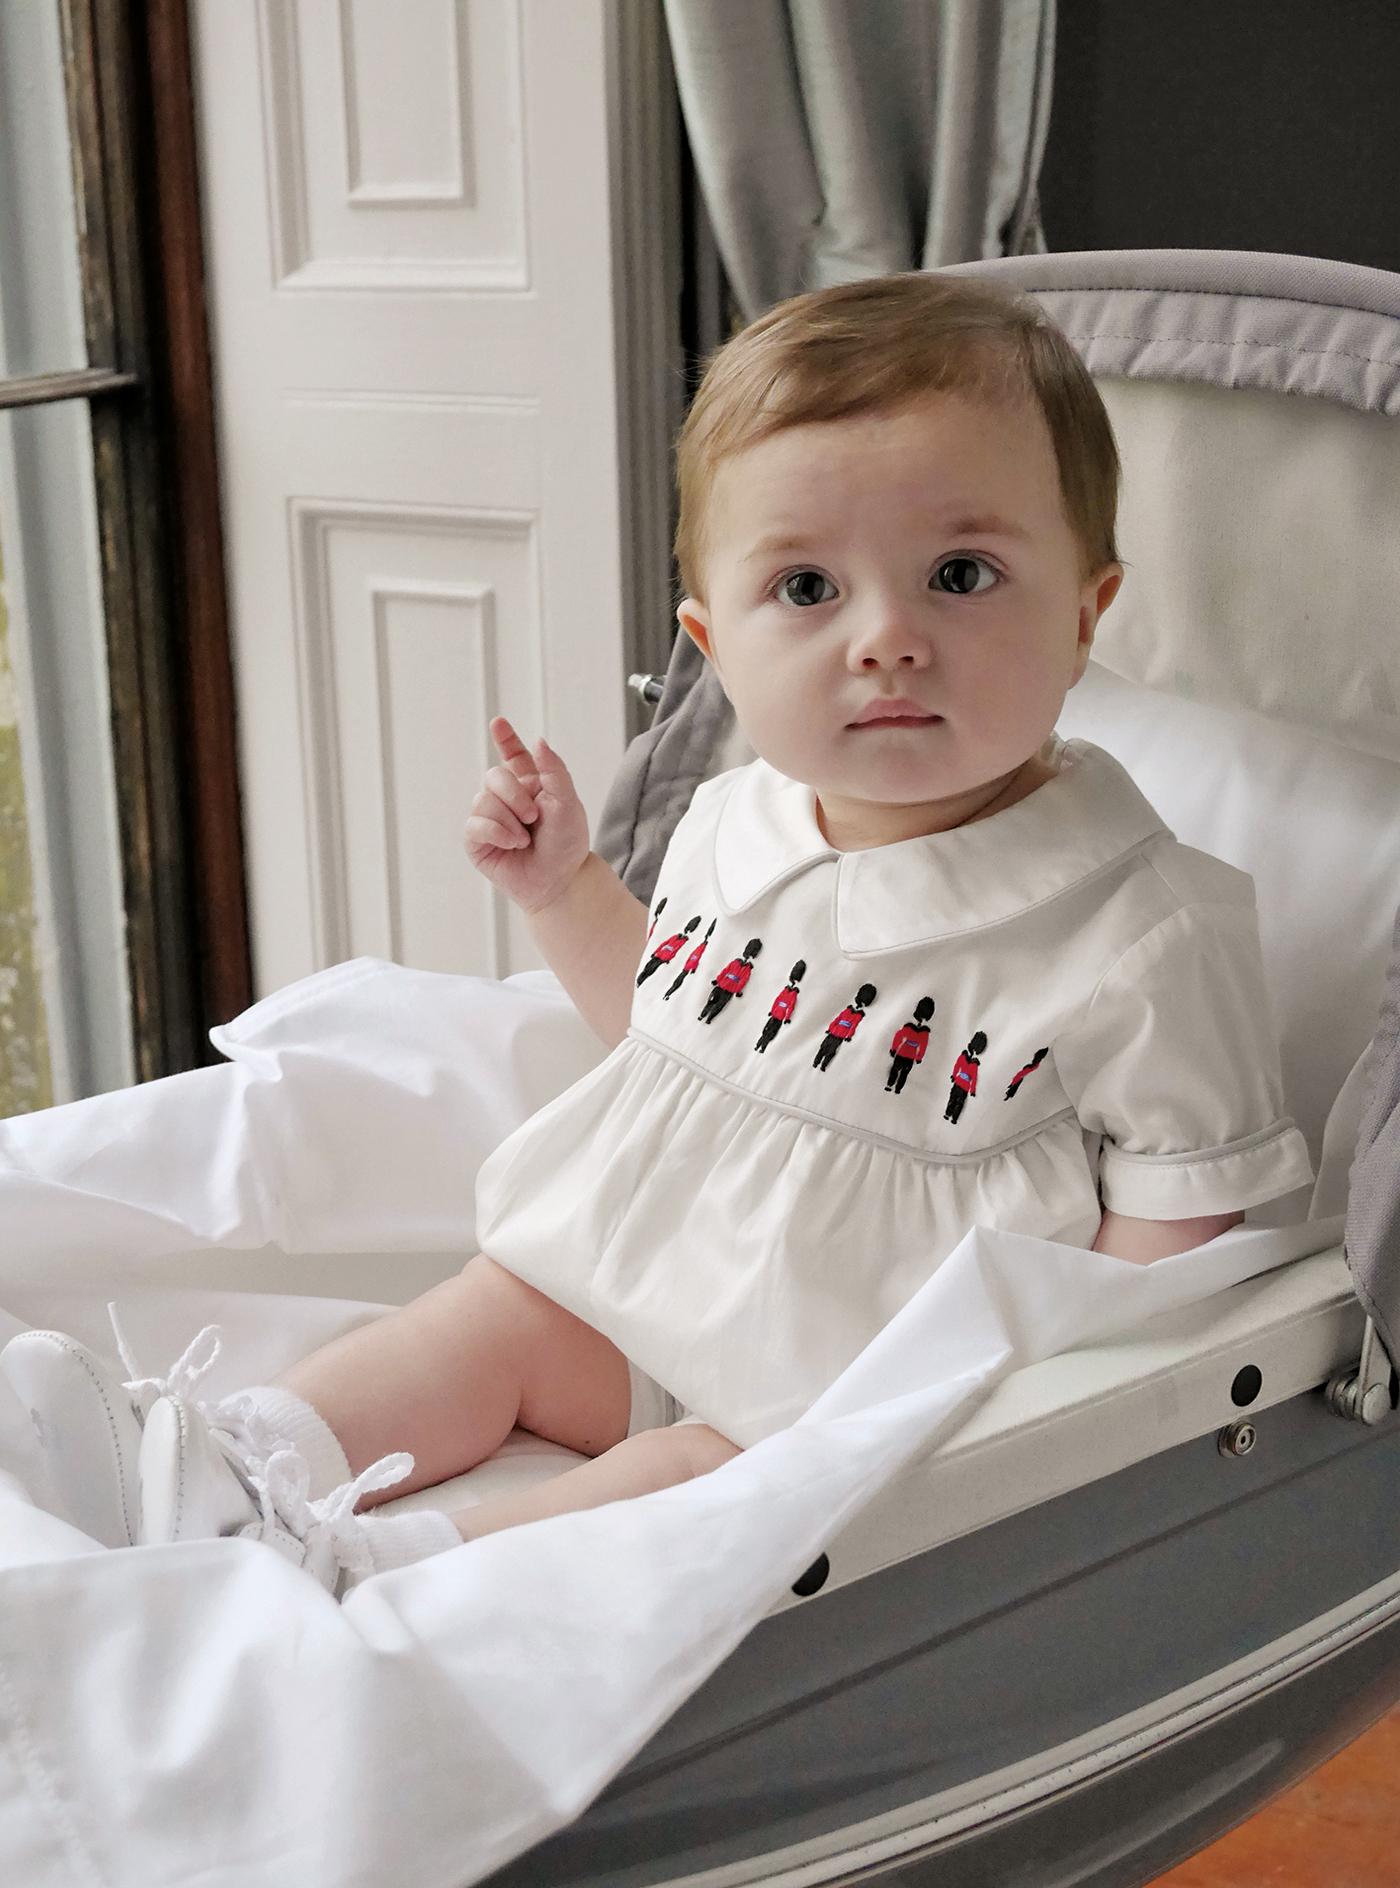 Rachel Riley: Royal gehütet Babykleidchen aus der Heritage-Kollektion (76 €) www.rachelriley.co.uk